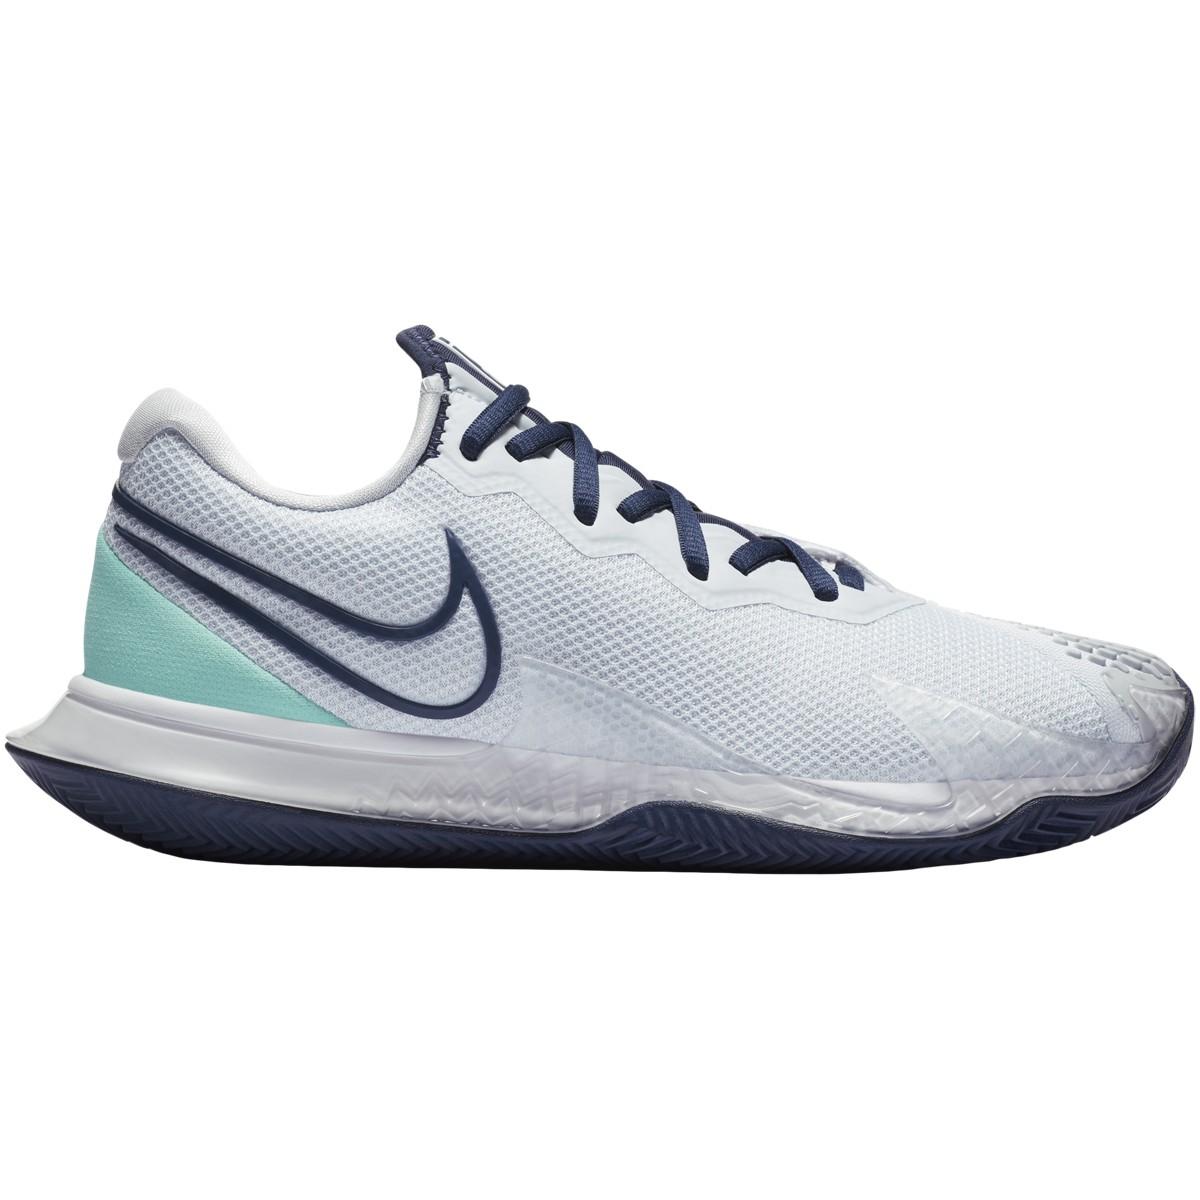 chaussure de tennis homme terre battue nike